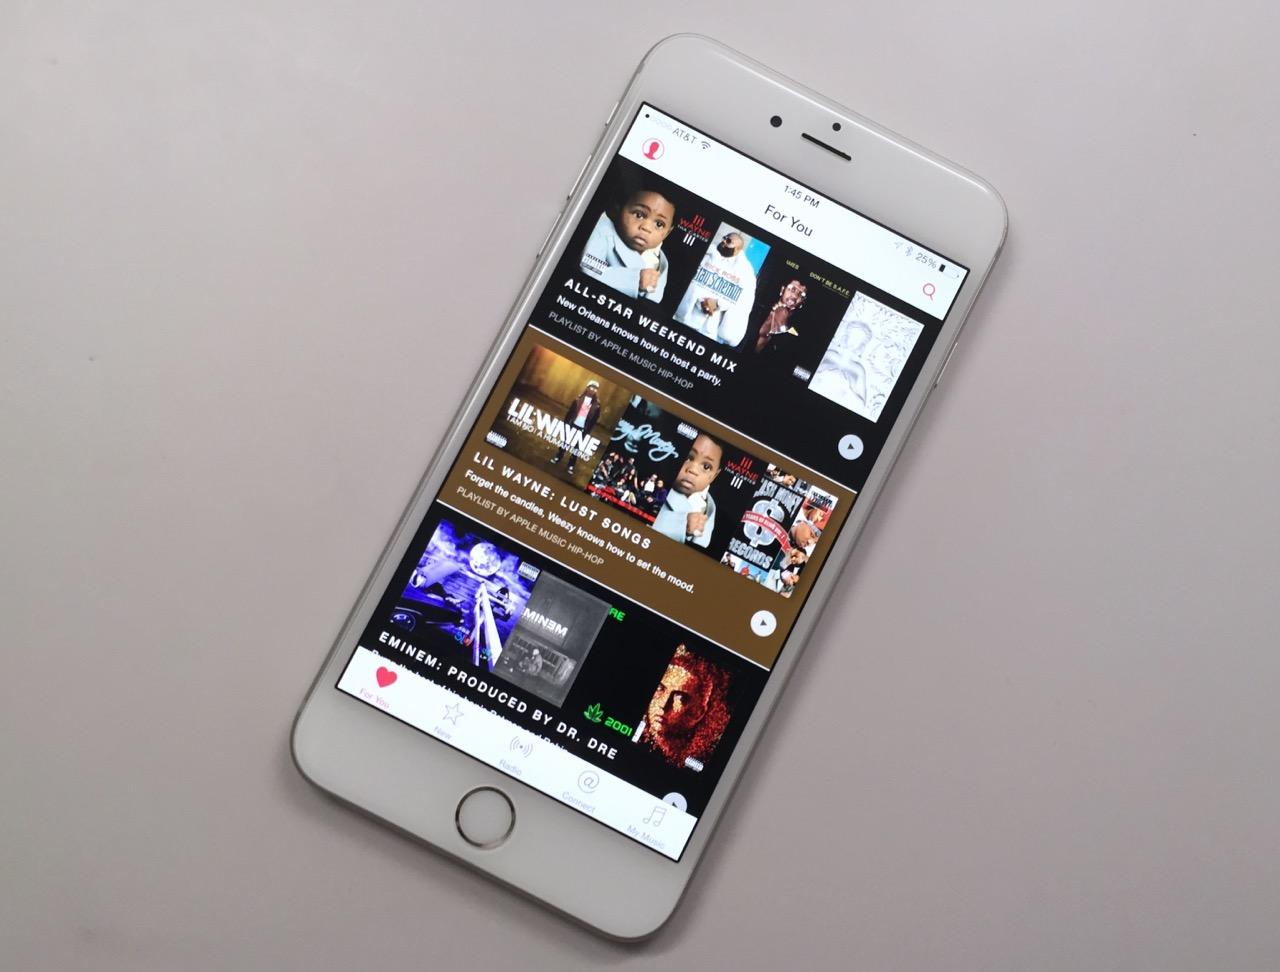 iPhone 6 Plus iOS 8 4 Review